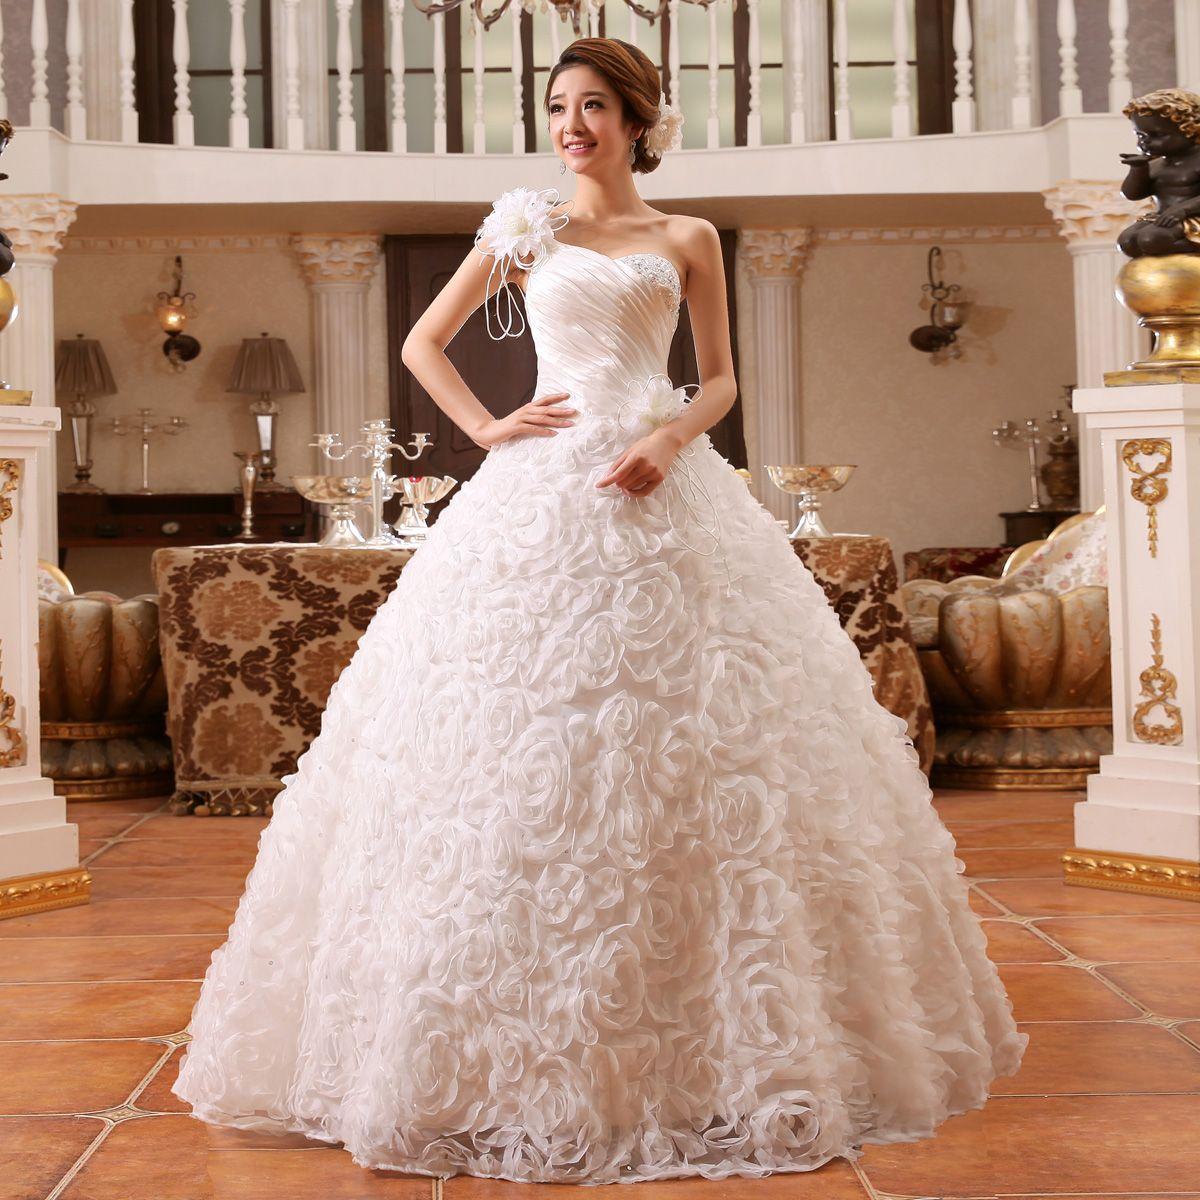 d52e3ec209b 2017 New Arrival Sweet Flowers Crystal Wedding Dress Bride Strapless ...